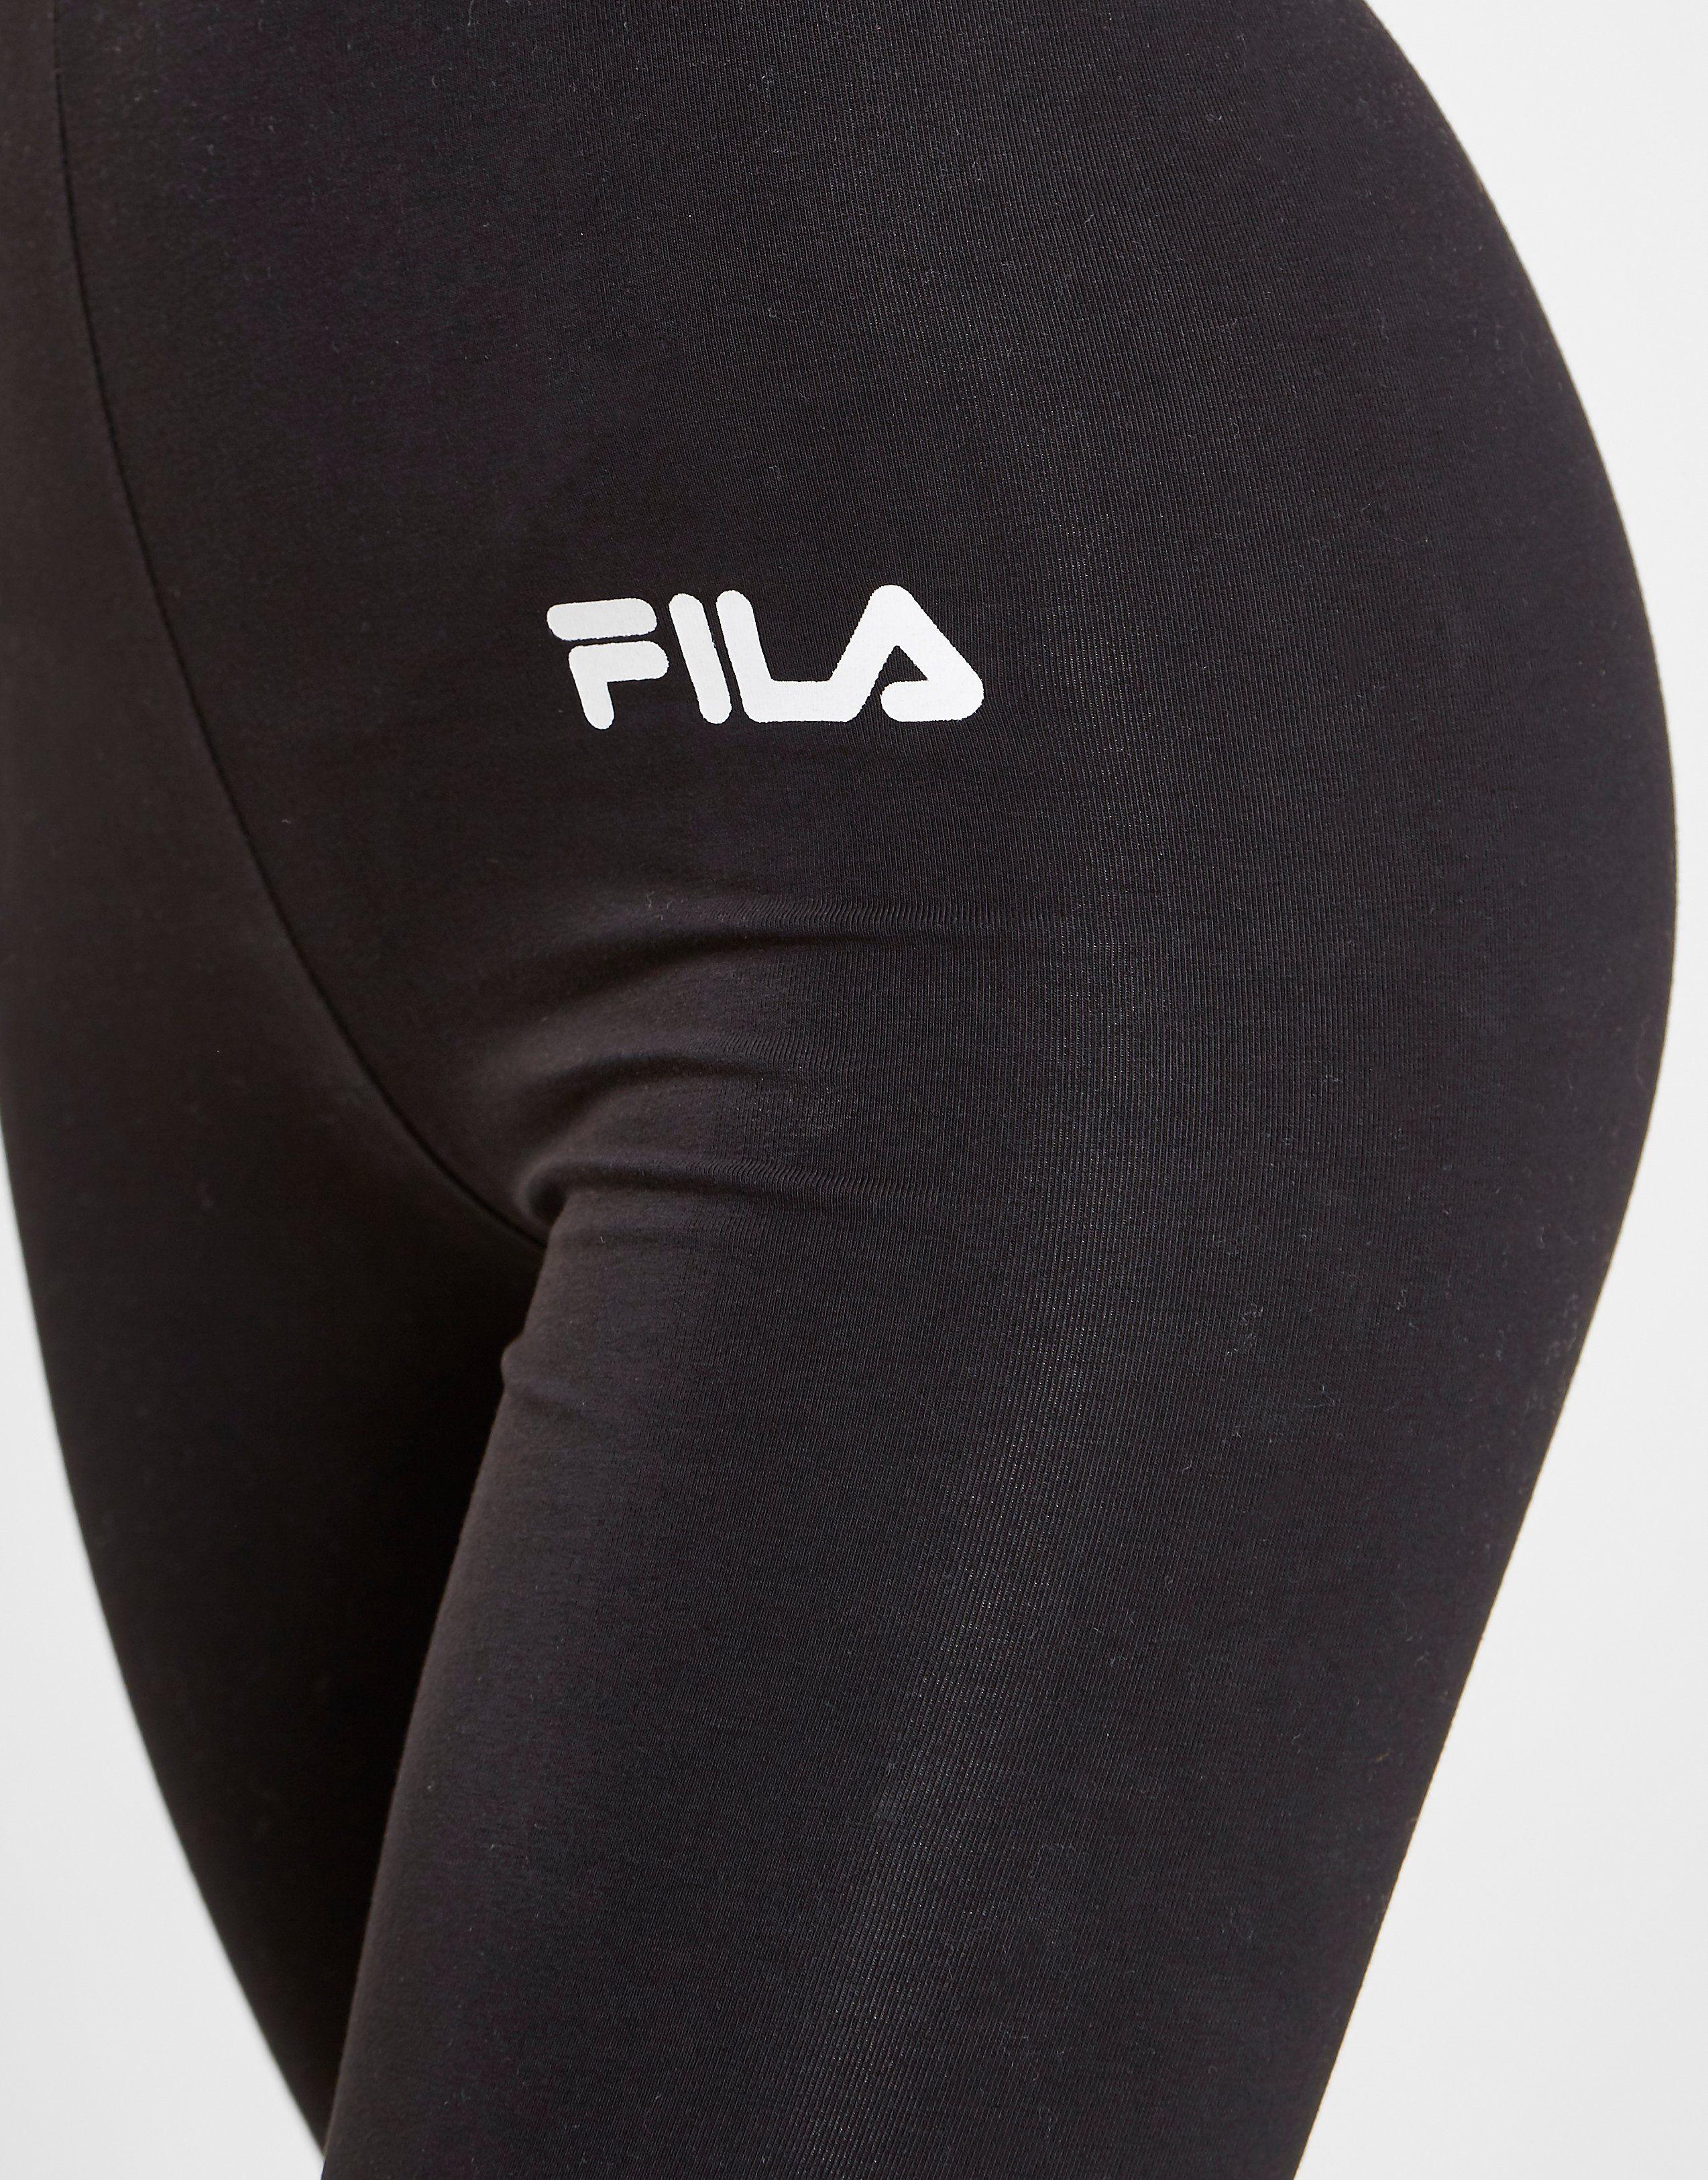 Fila Colour Block Leggings